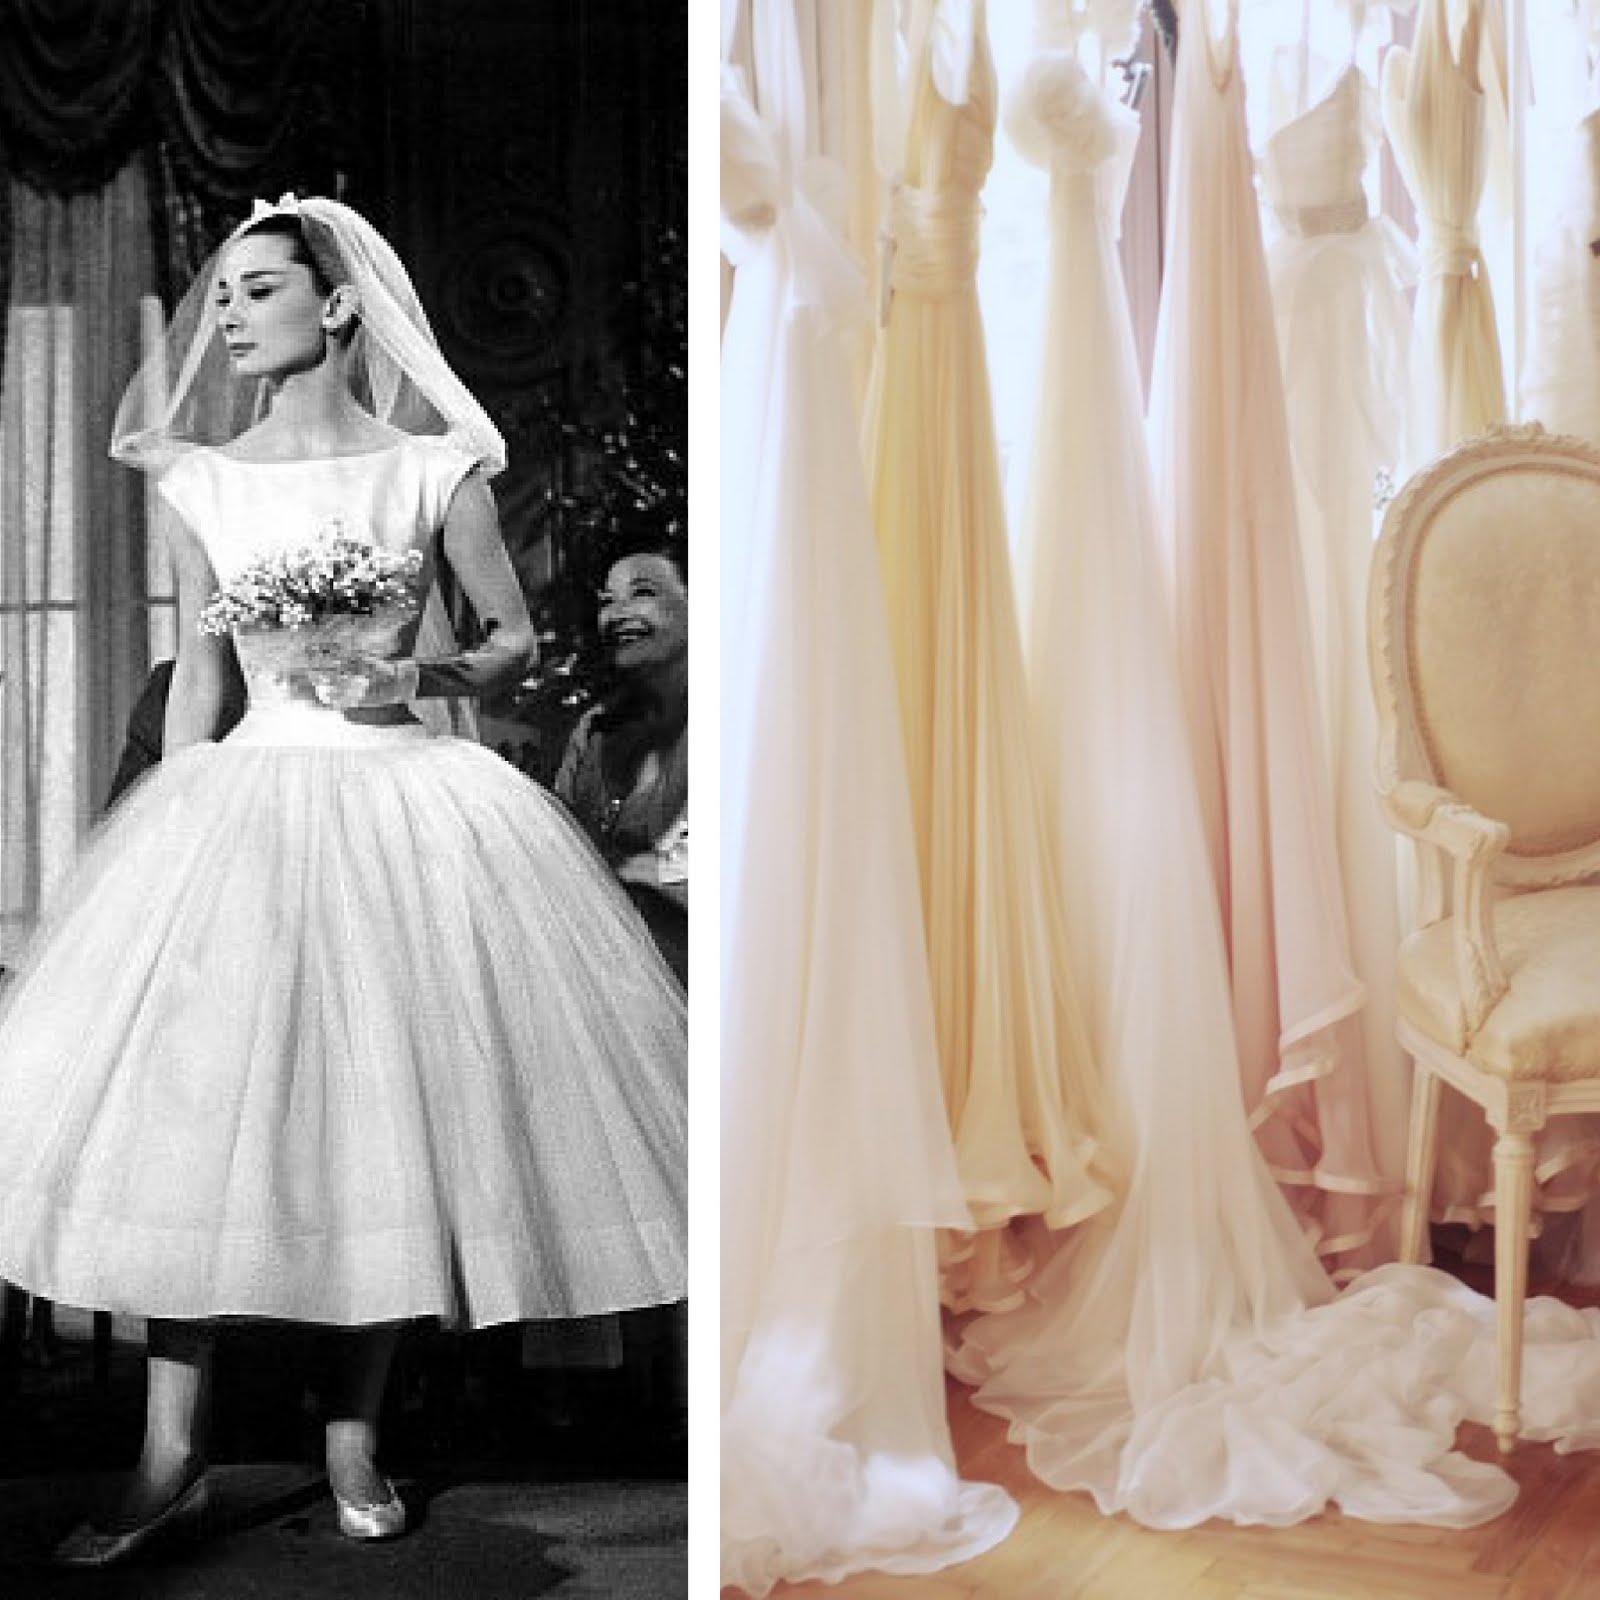 trying on wedding dresses